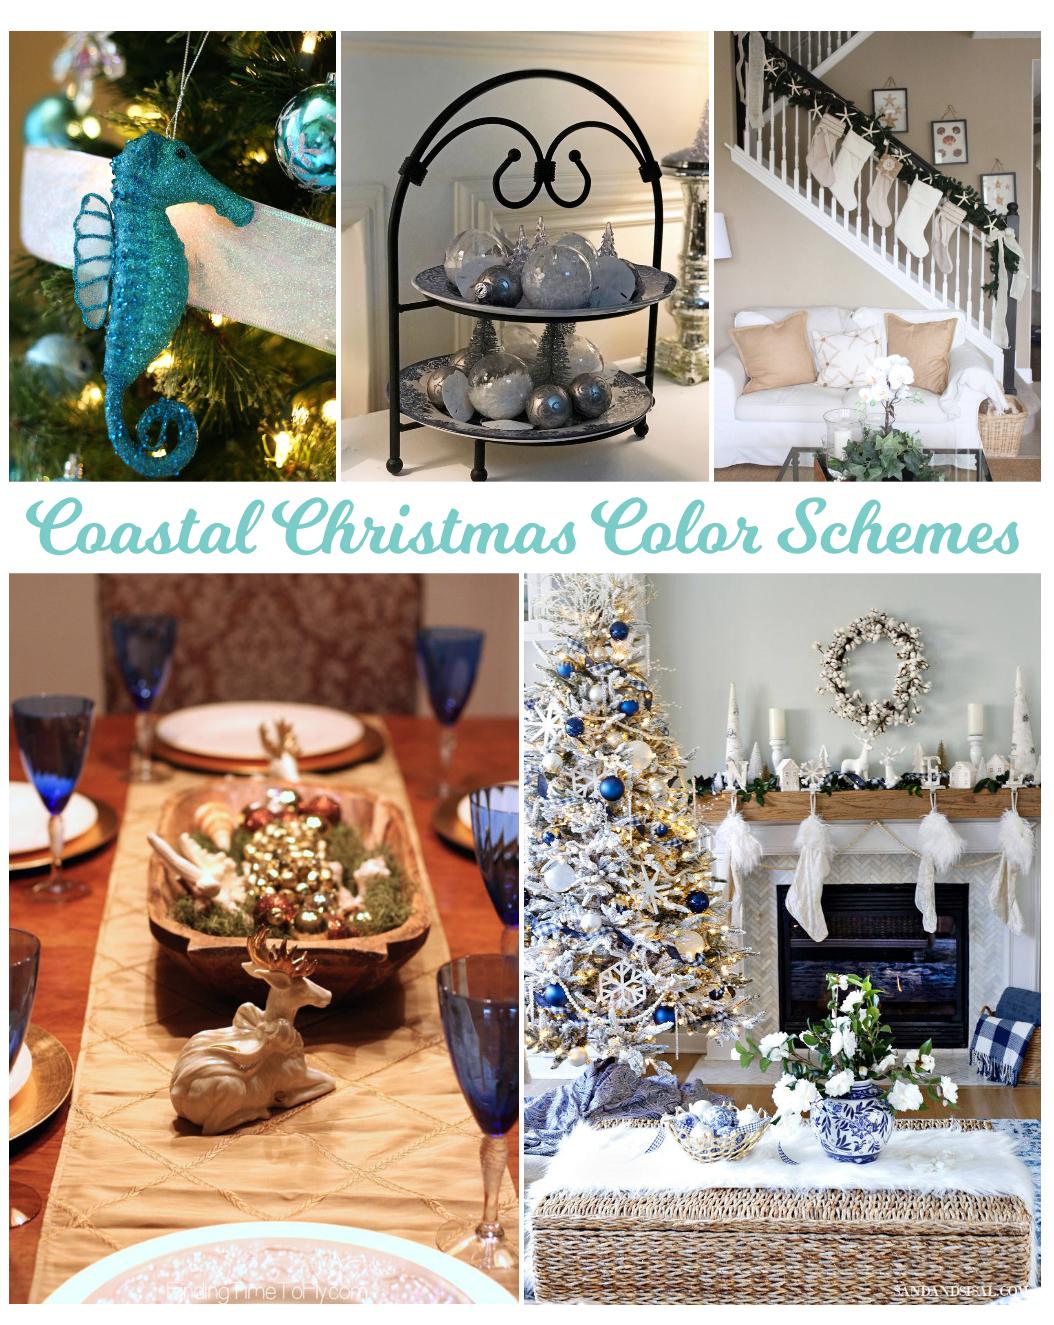 100 Coastal Christmas Decor Ideas - Color Schemes